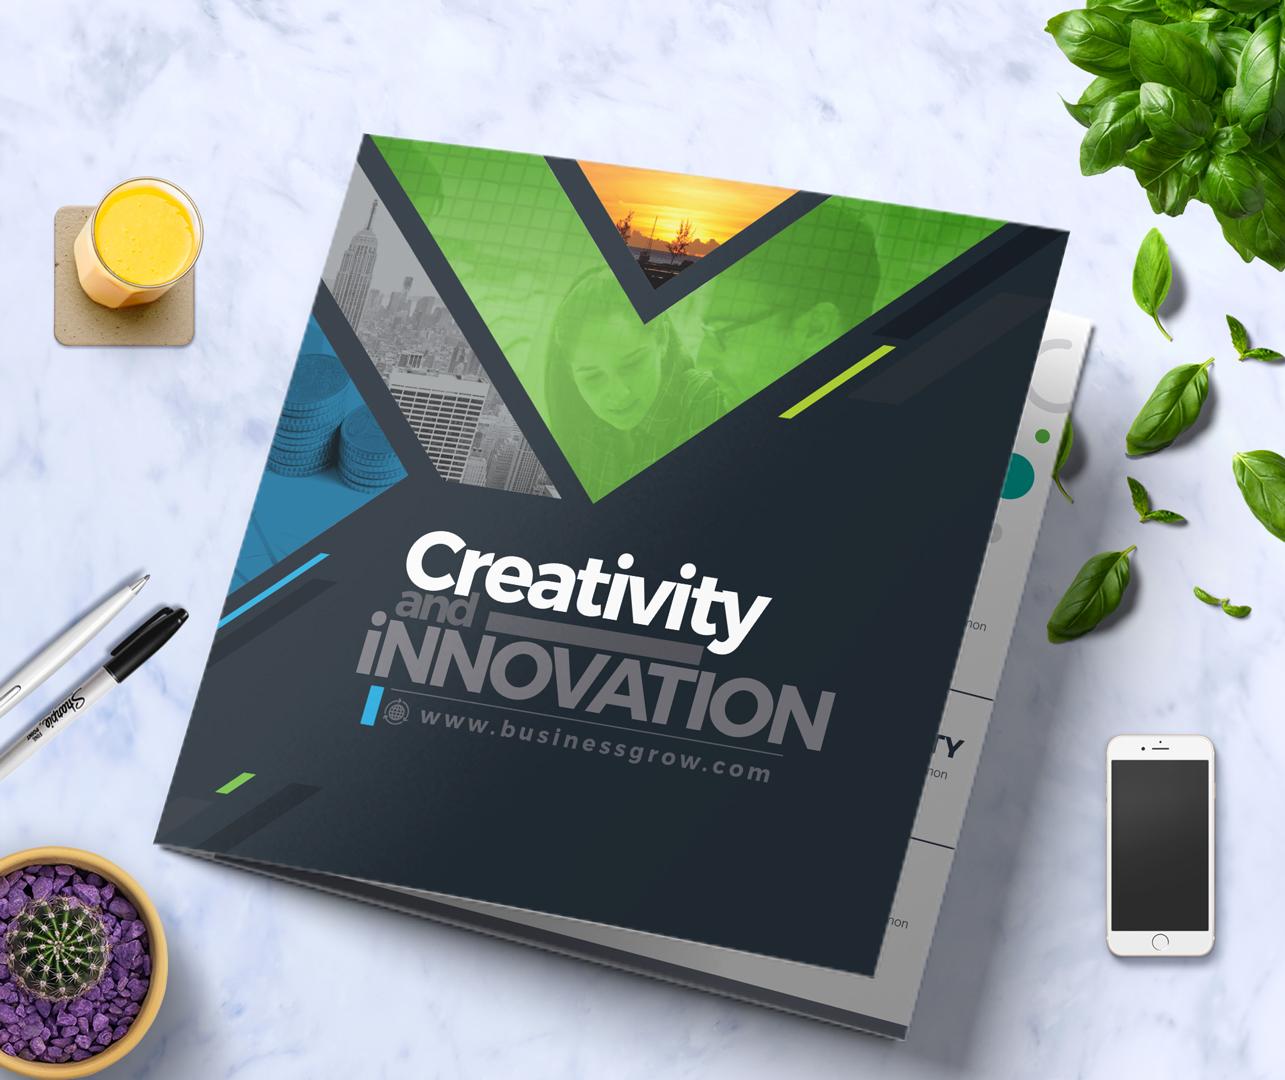 https://s3.tmimgcdn.com/templates/4908/scr/1542725311126_01_Square-tri-fold-brochure-front-cover.jpg